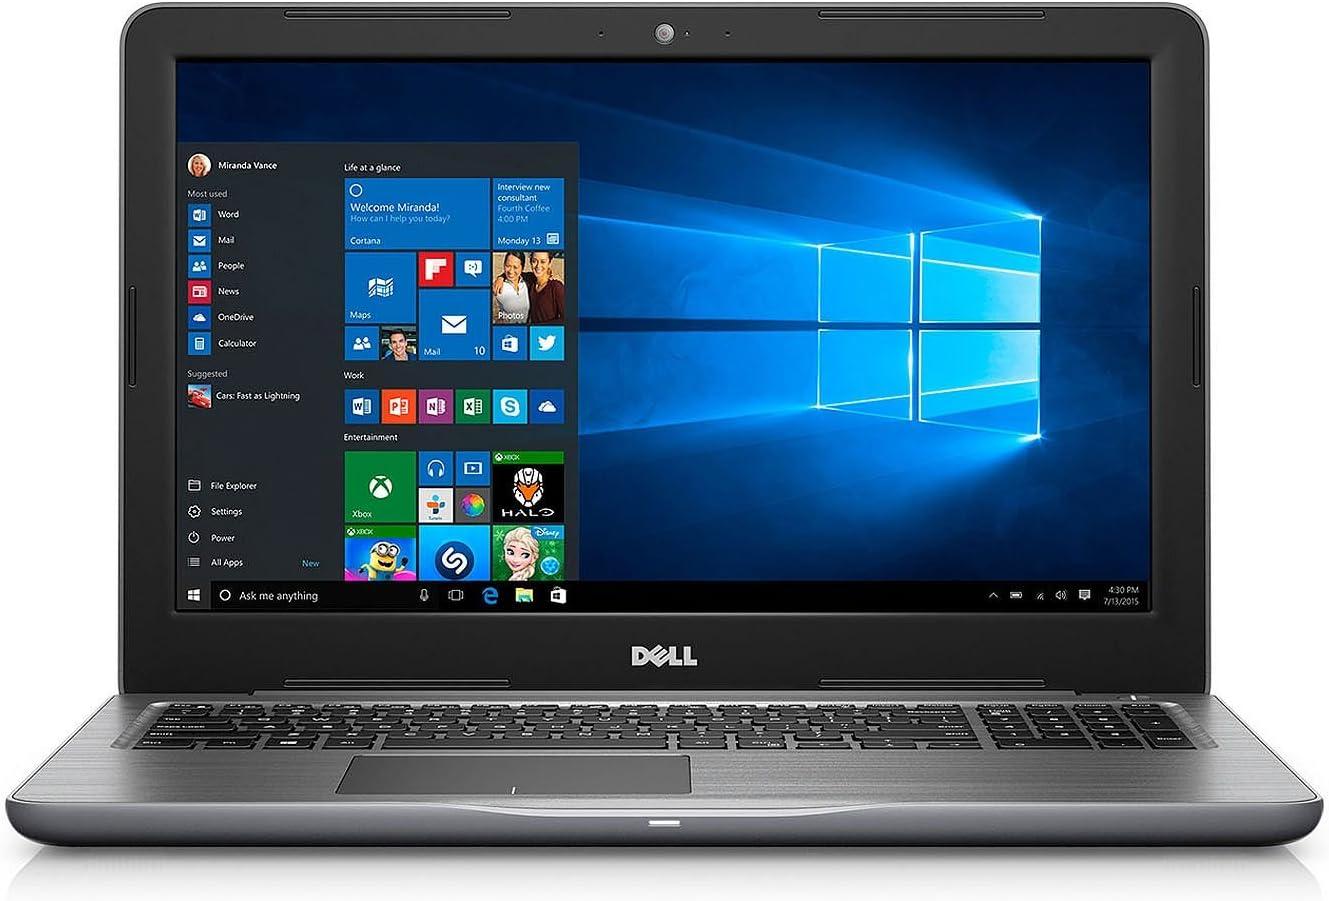 "Dell Inspiron 15.6"" Full HD Touchscreen Flagship Laptop, i7-7500U, 16GB DDR4, 1TB HDD, AMD Radeon R7 M445 Graphics, 802.11ac, Bluetooth 4.2, HD Webcam, 2 x USB 3.0, HDMI, Win 10"